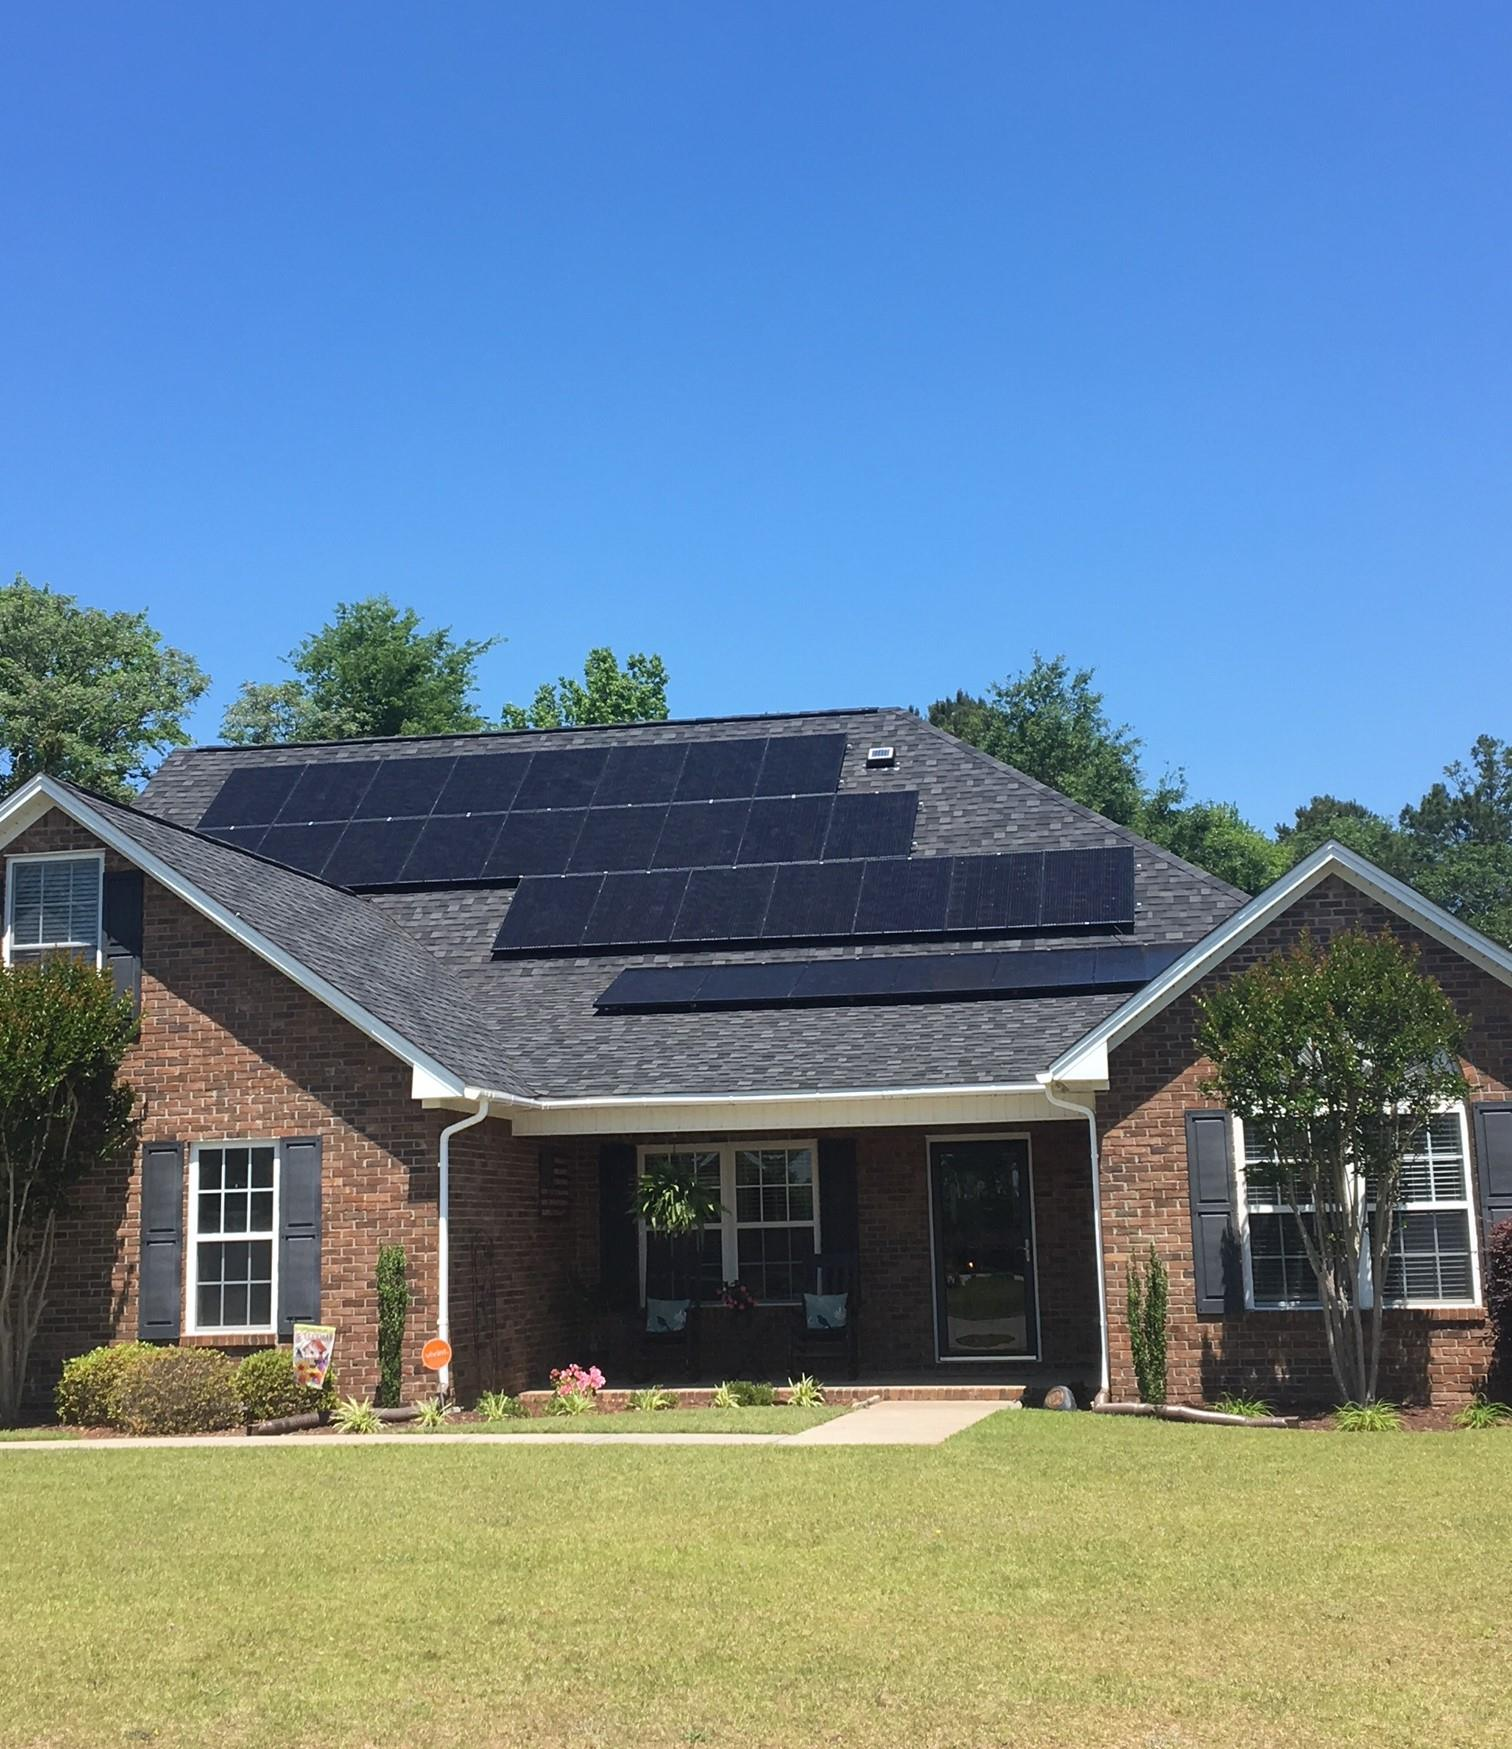 Residential Solar Panel Installation in Texas